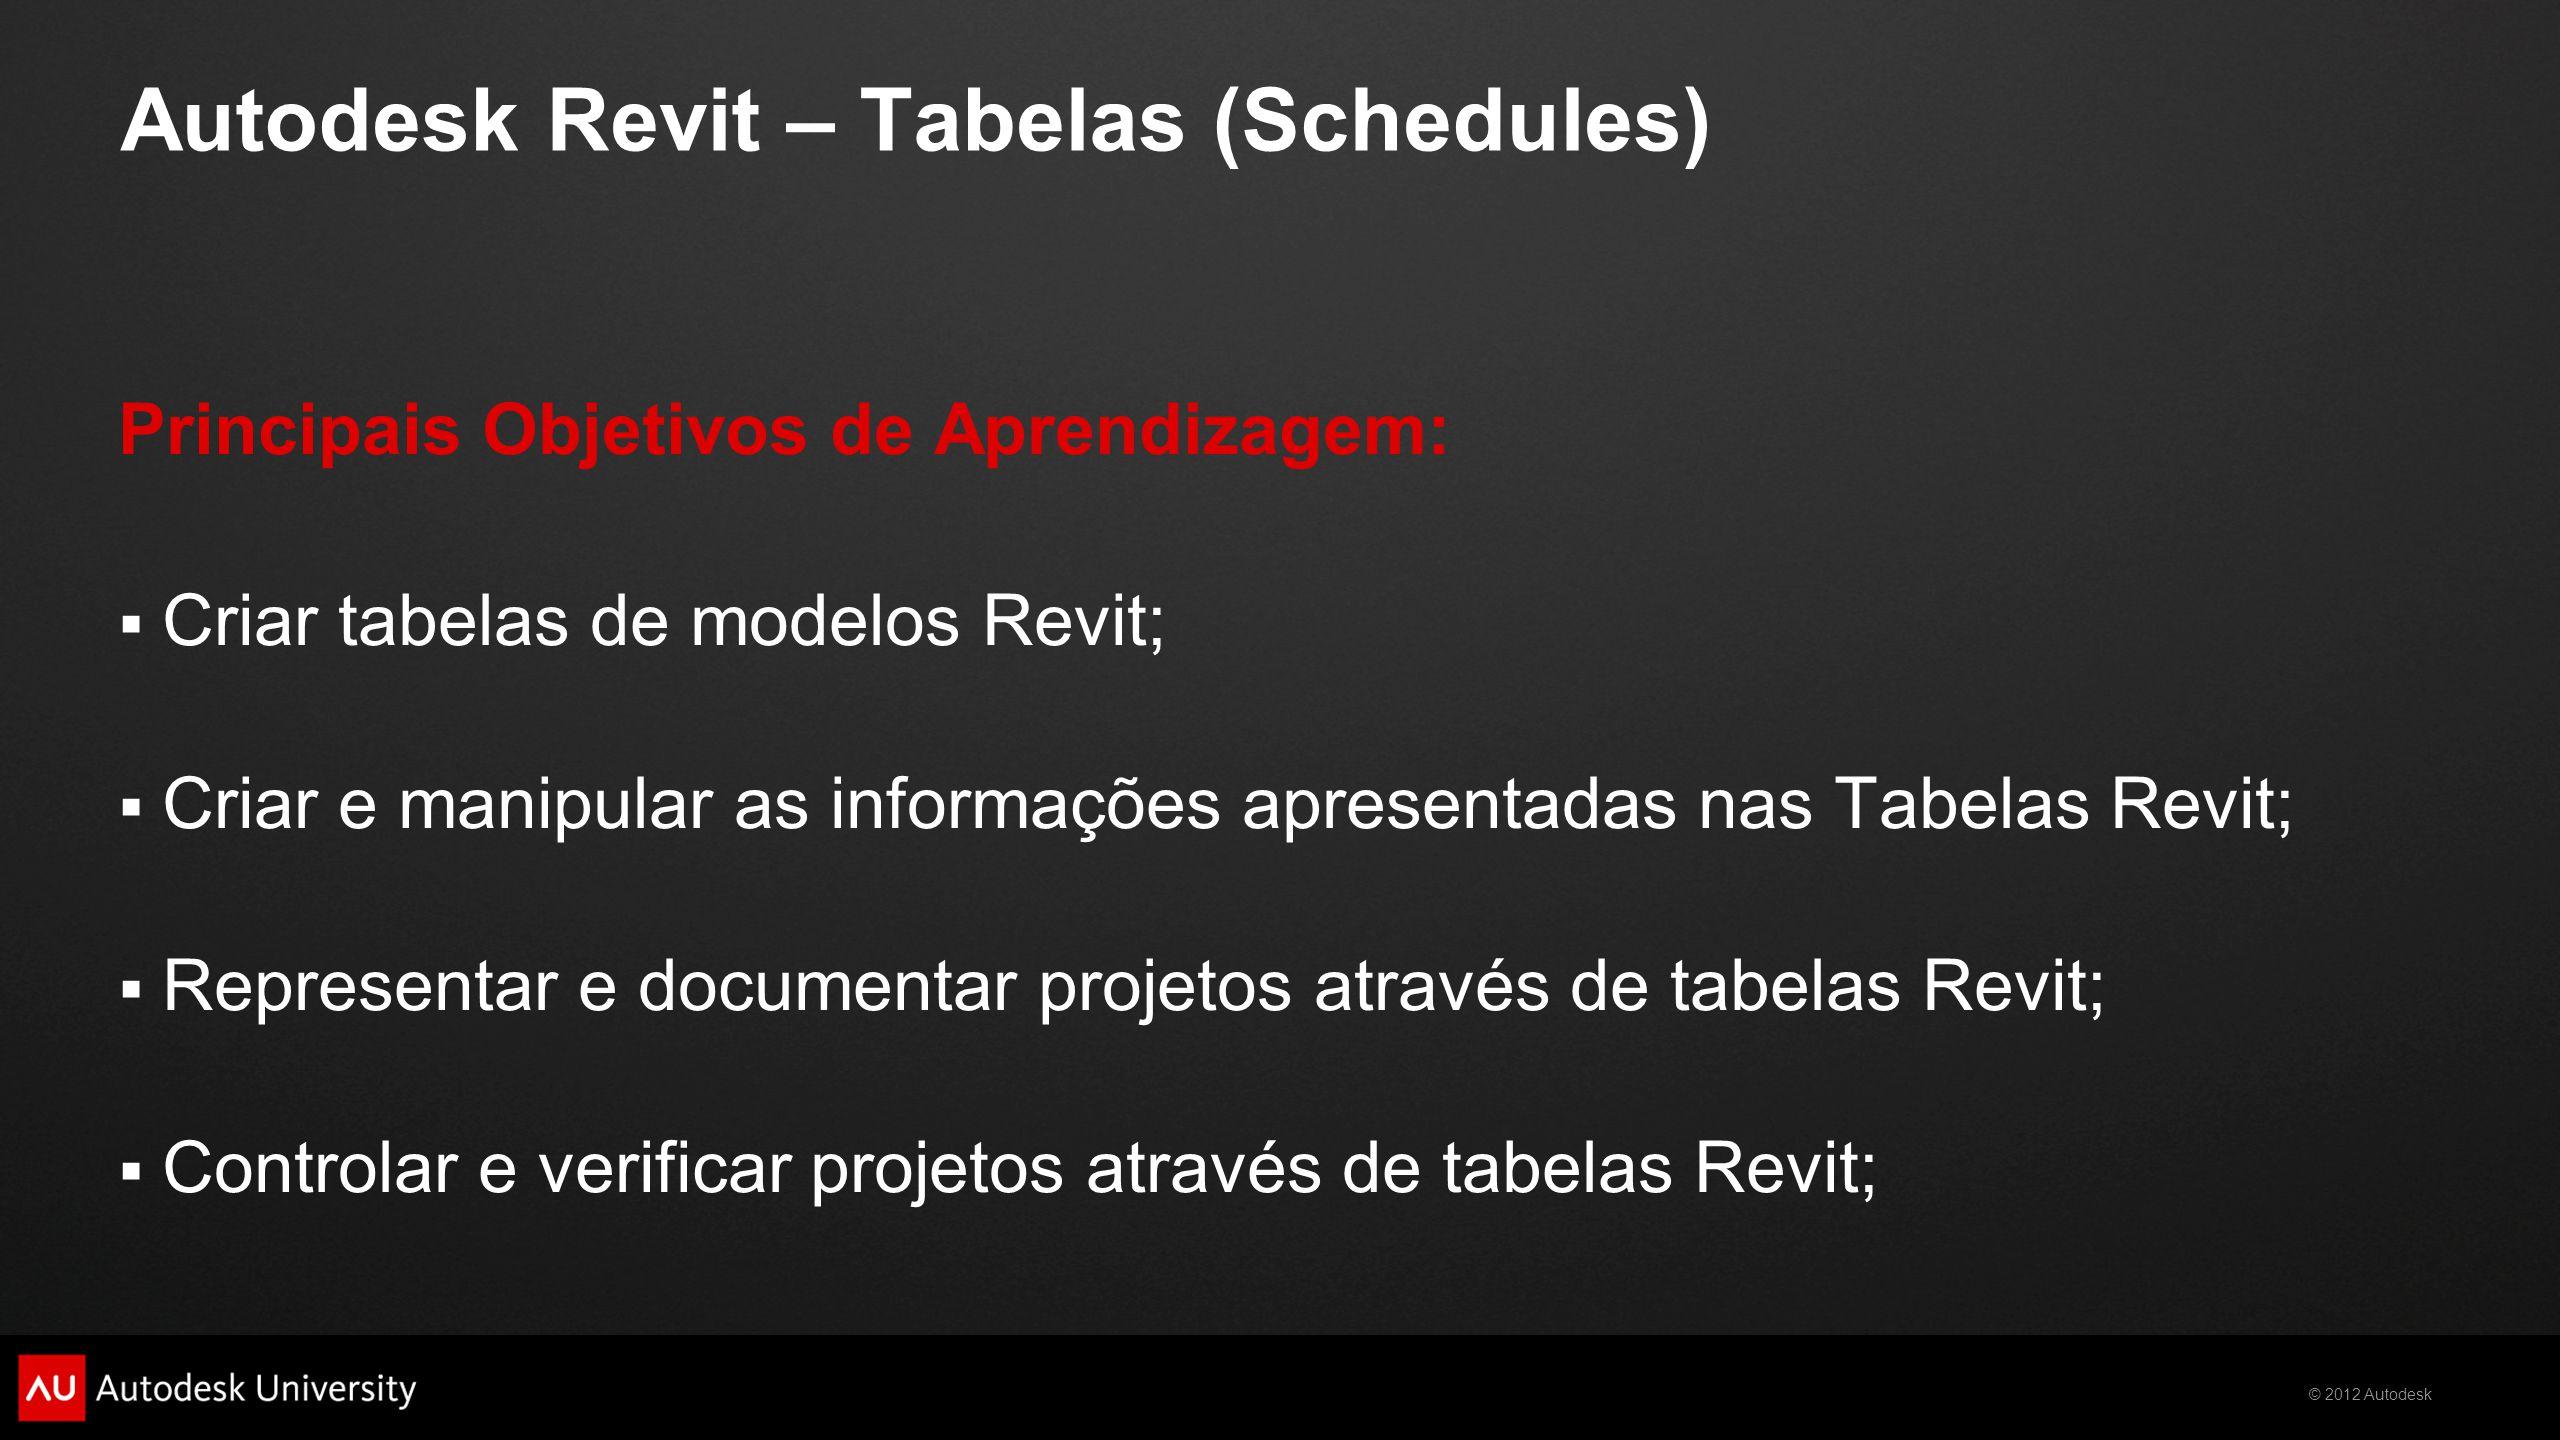 AB5201-V Autodesk Revit – Tabelas (Schedules) - ppt carregar